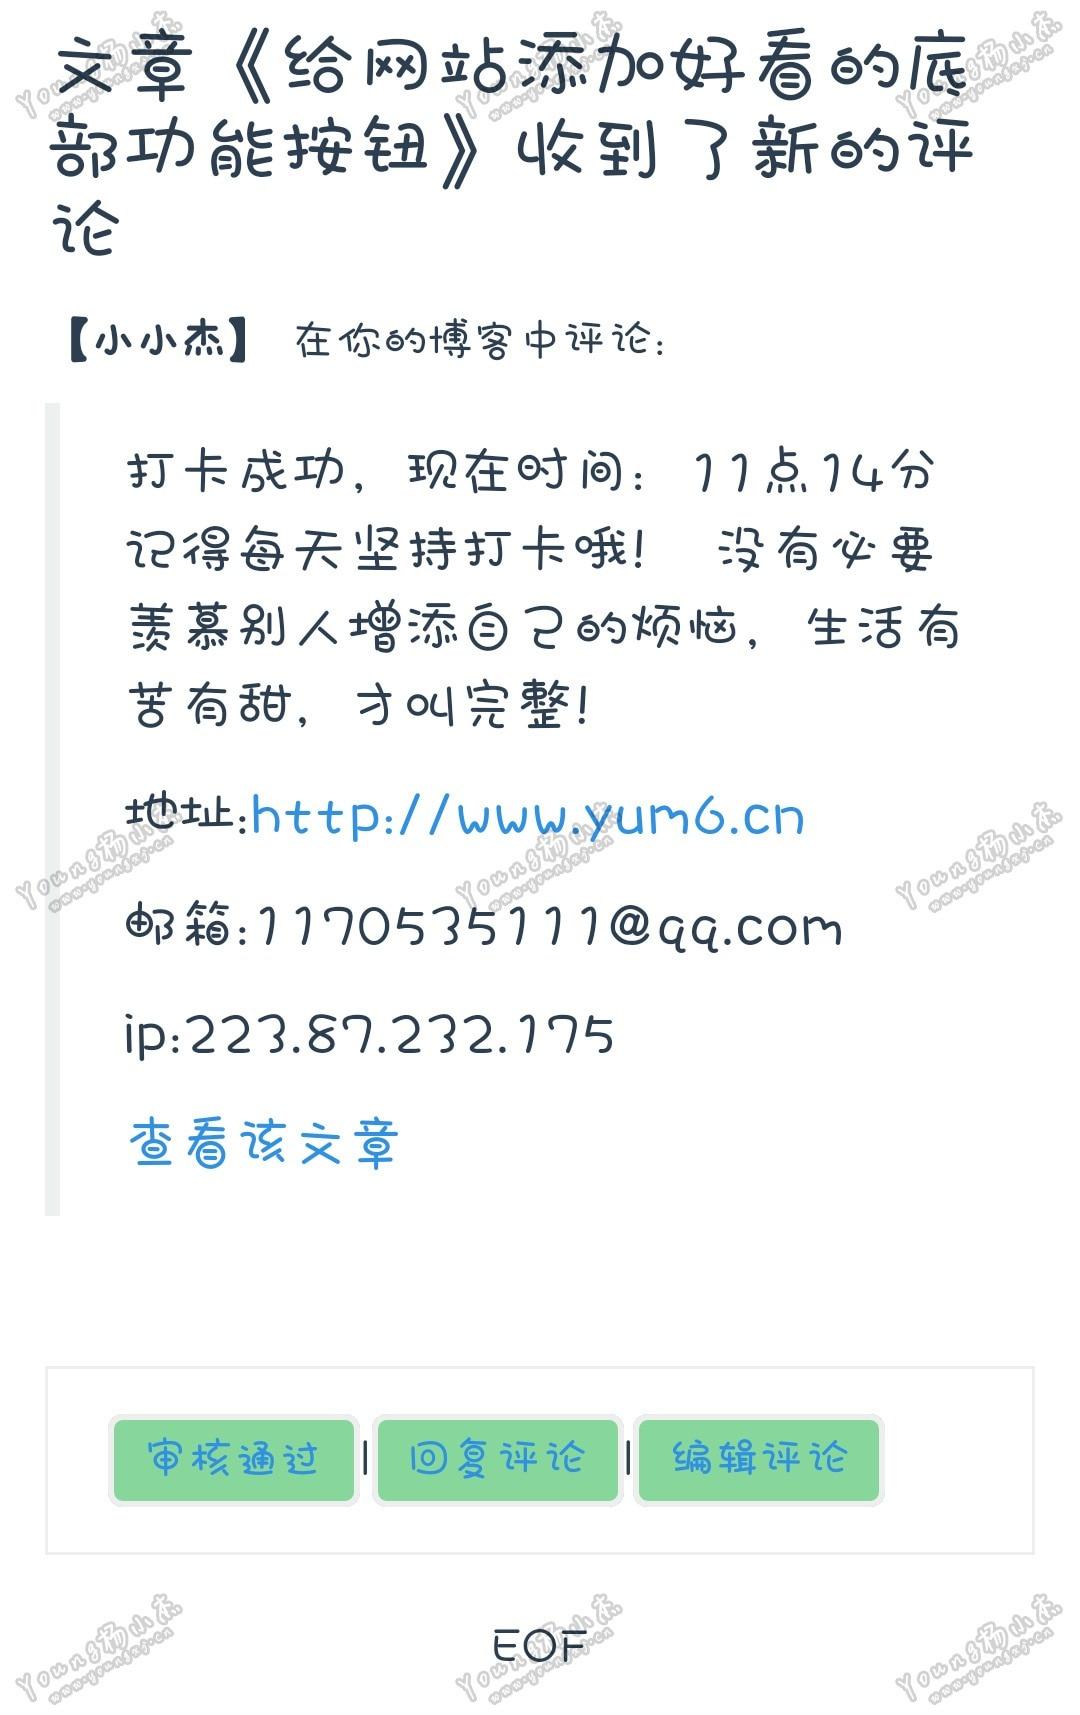 Server酱微信评论提醒1.2